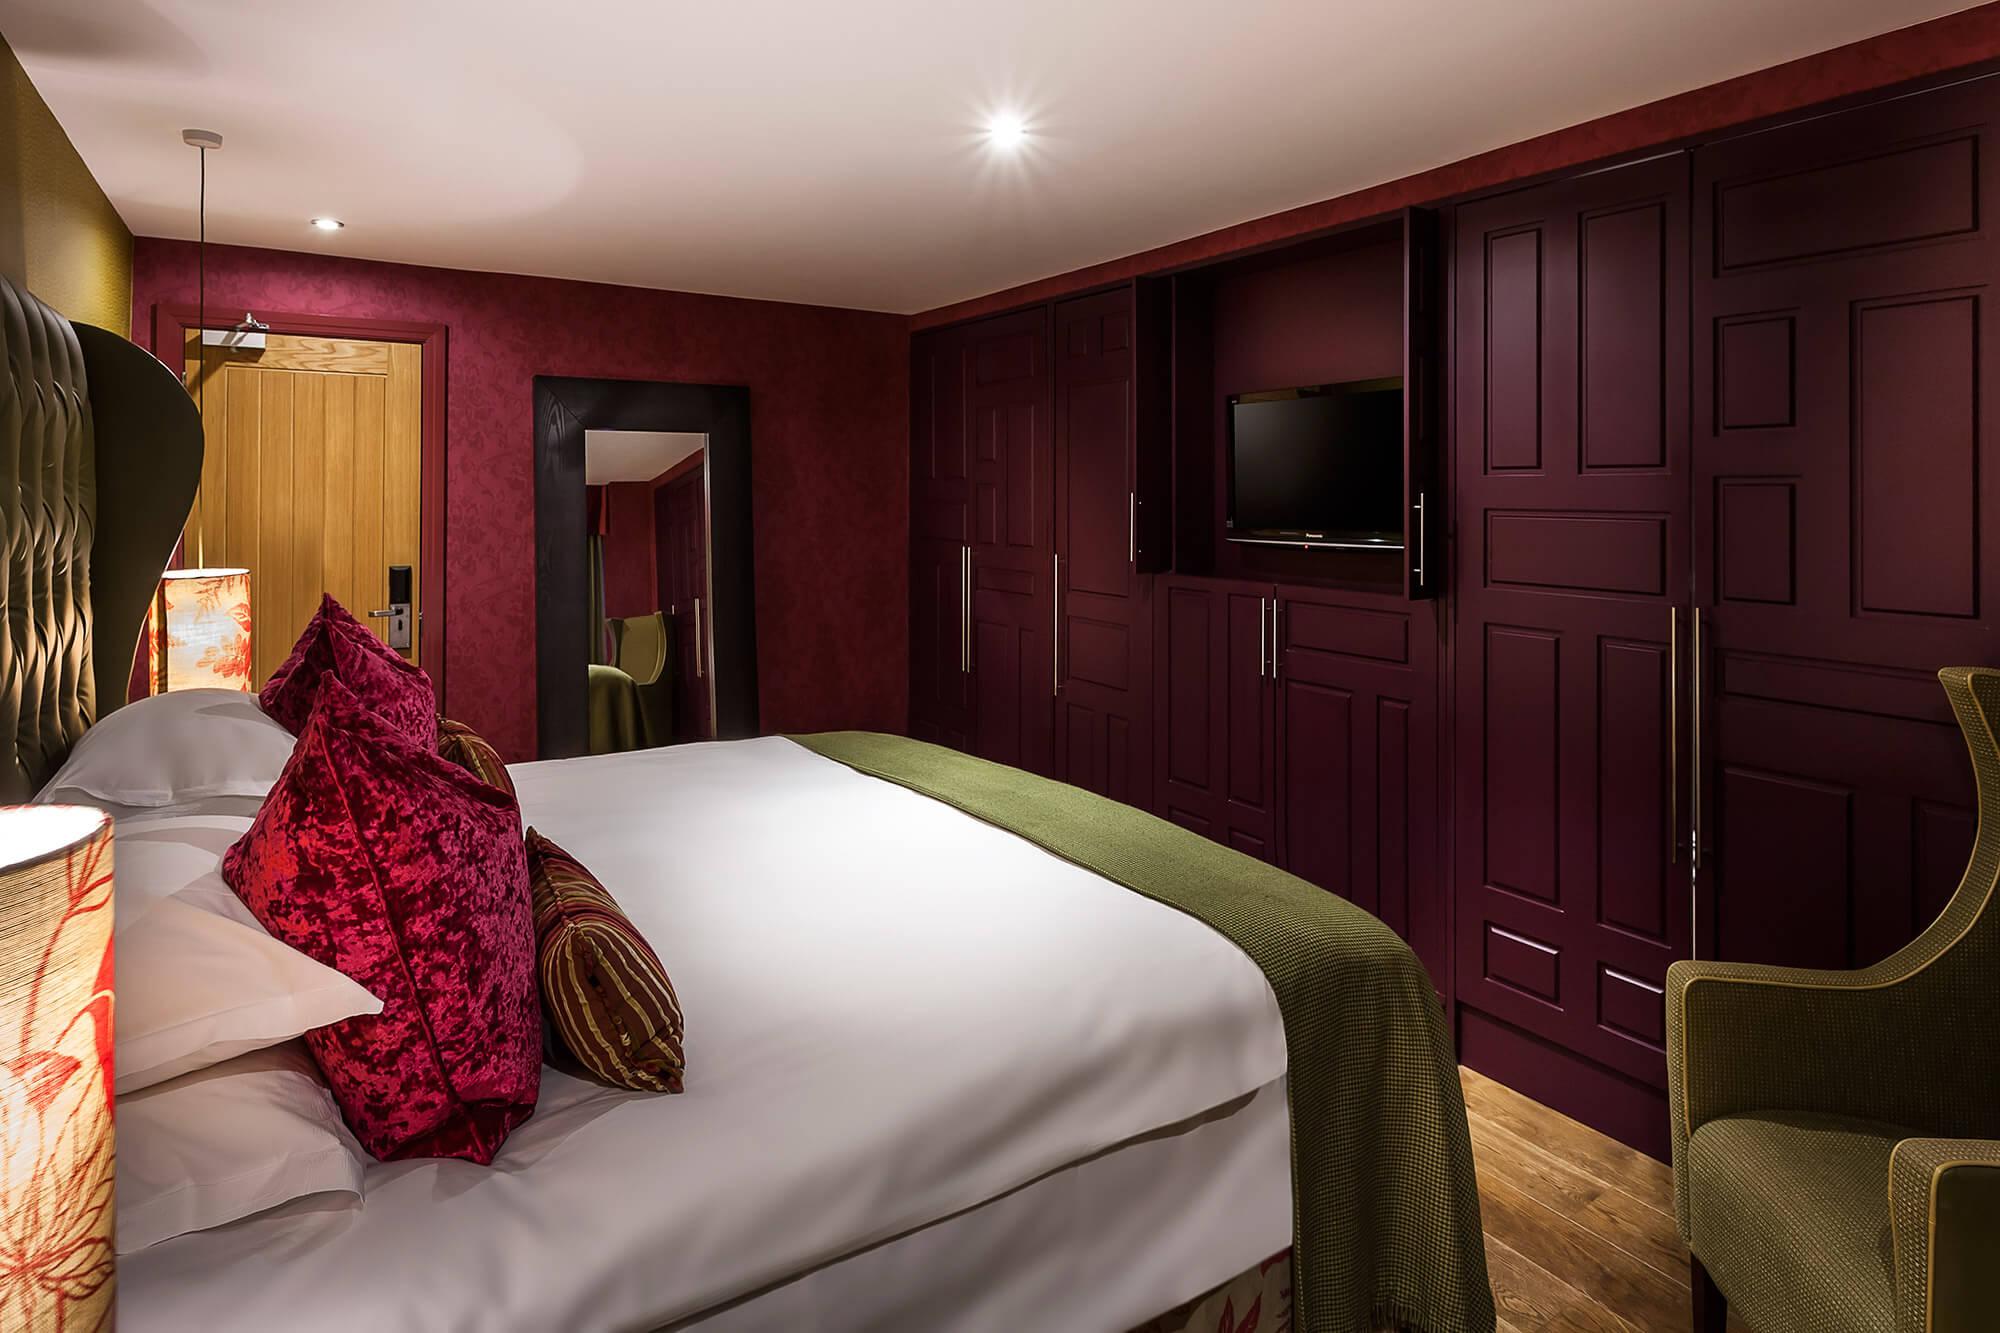 The Langdale Hotel Ultimate Room 103